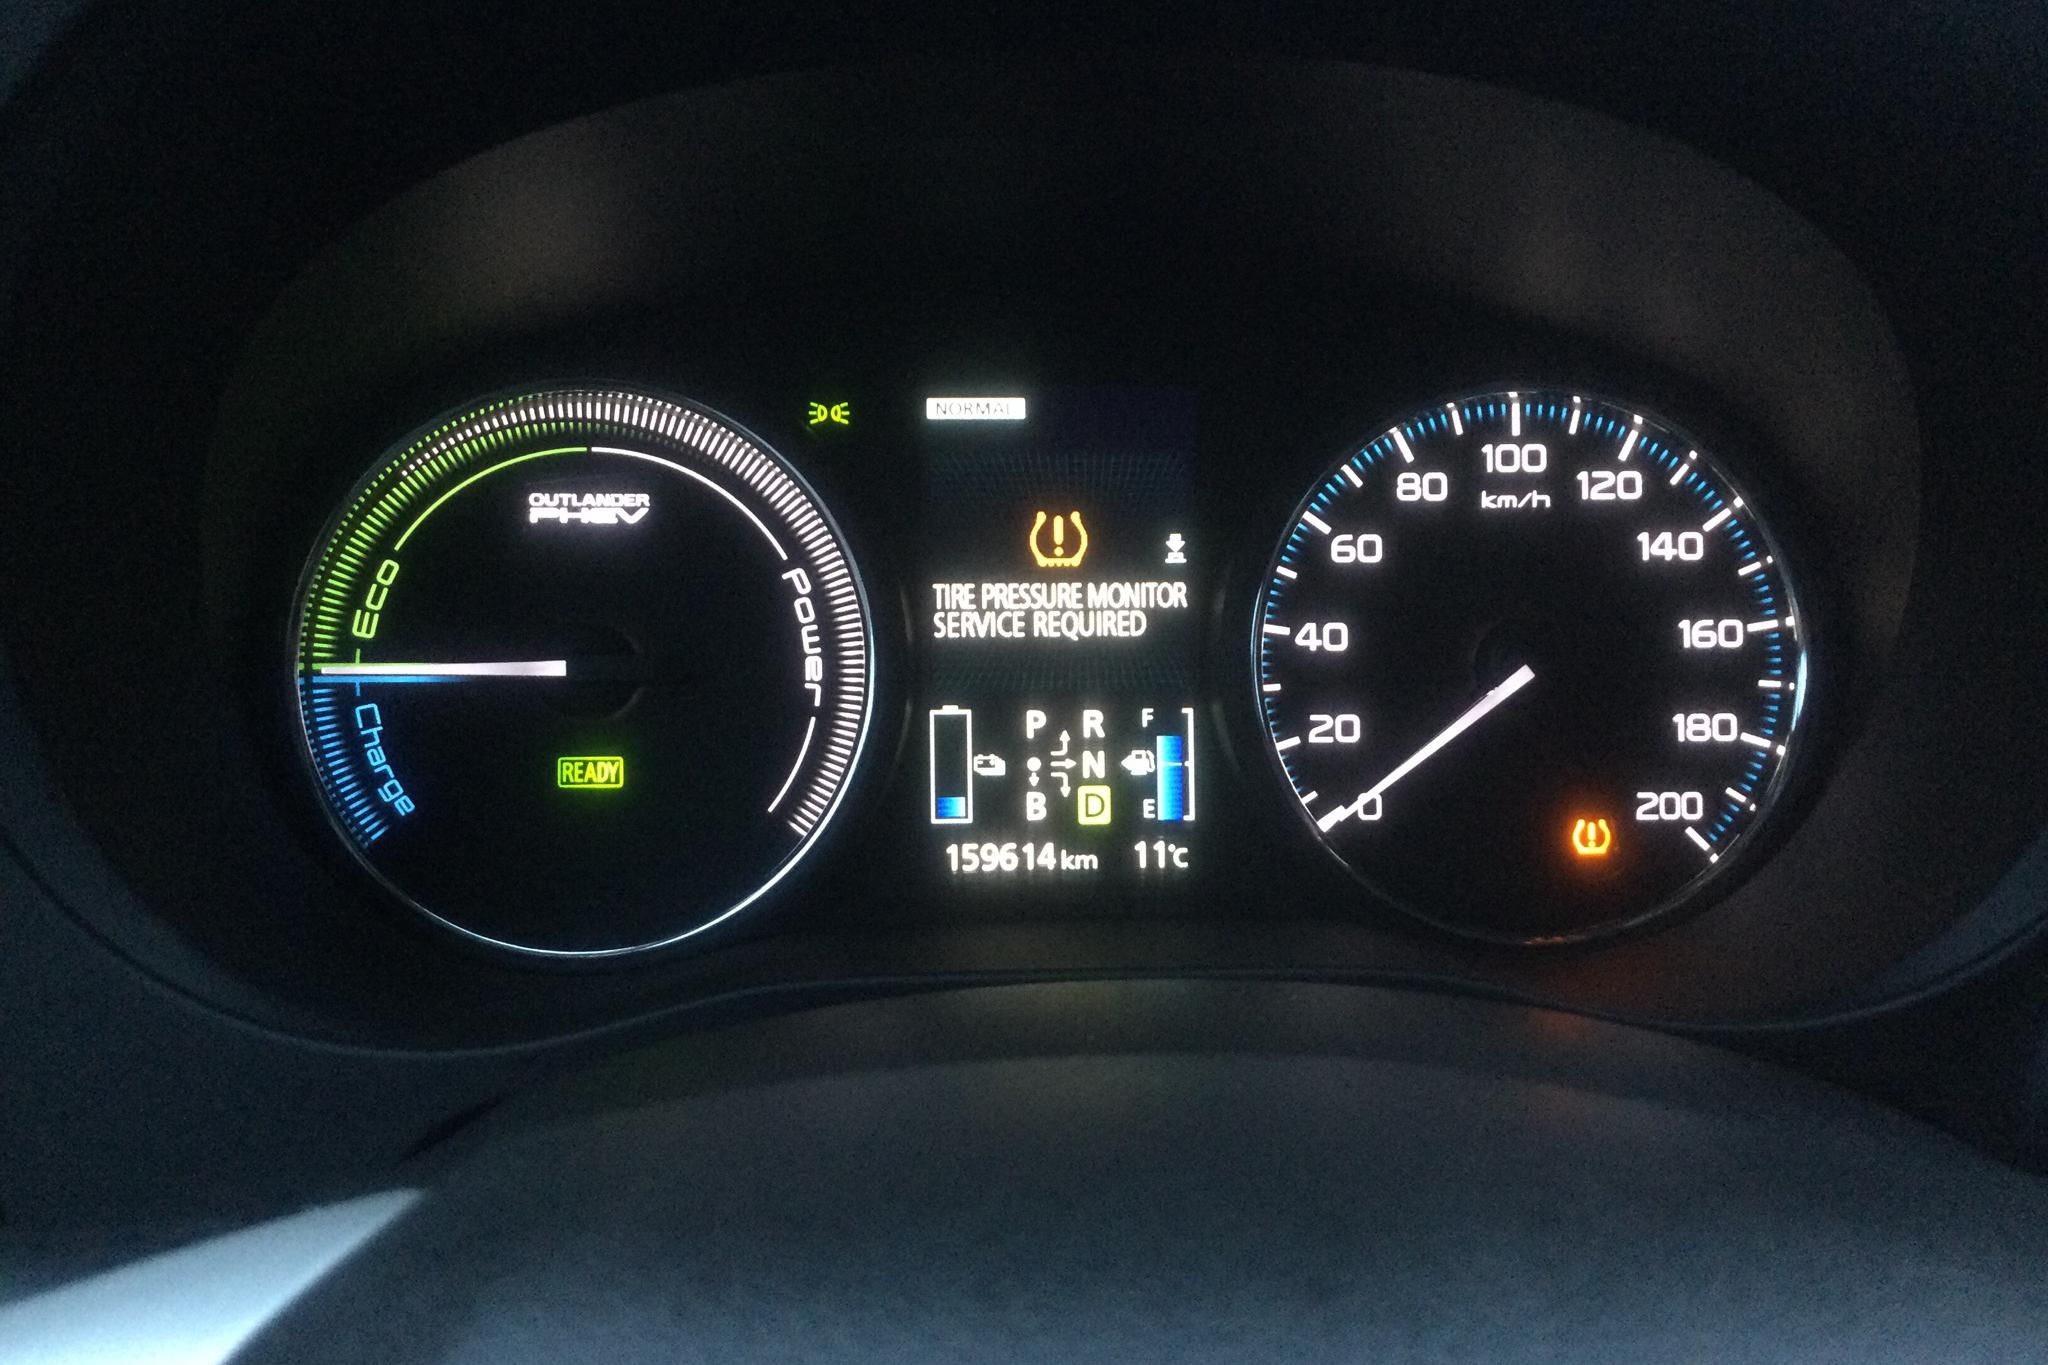 Mitsubishi Outlander 2.0 Plug-in Hybrid 4WD (121hk) - 159 610 km - Automatic - Dark Red - 2015